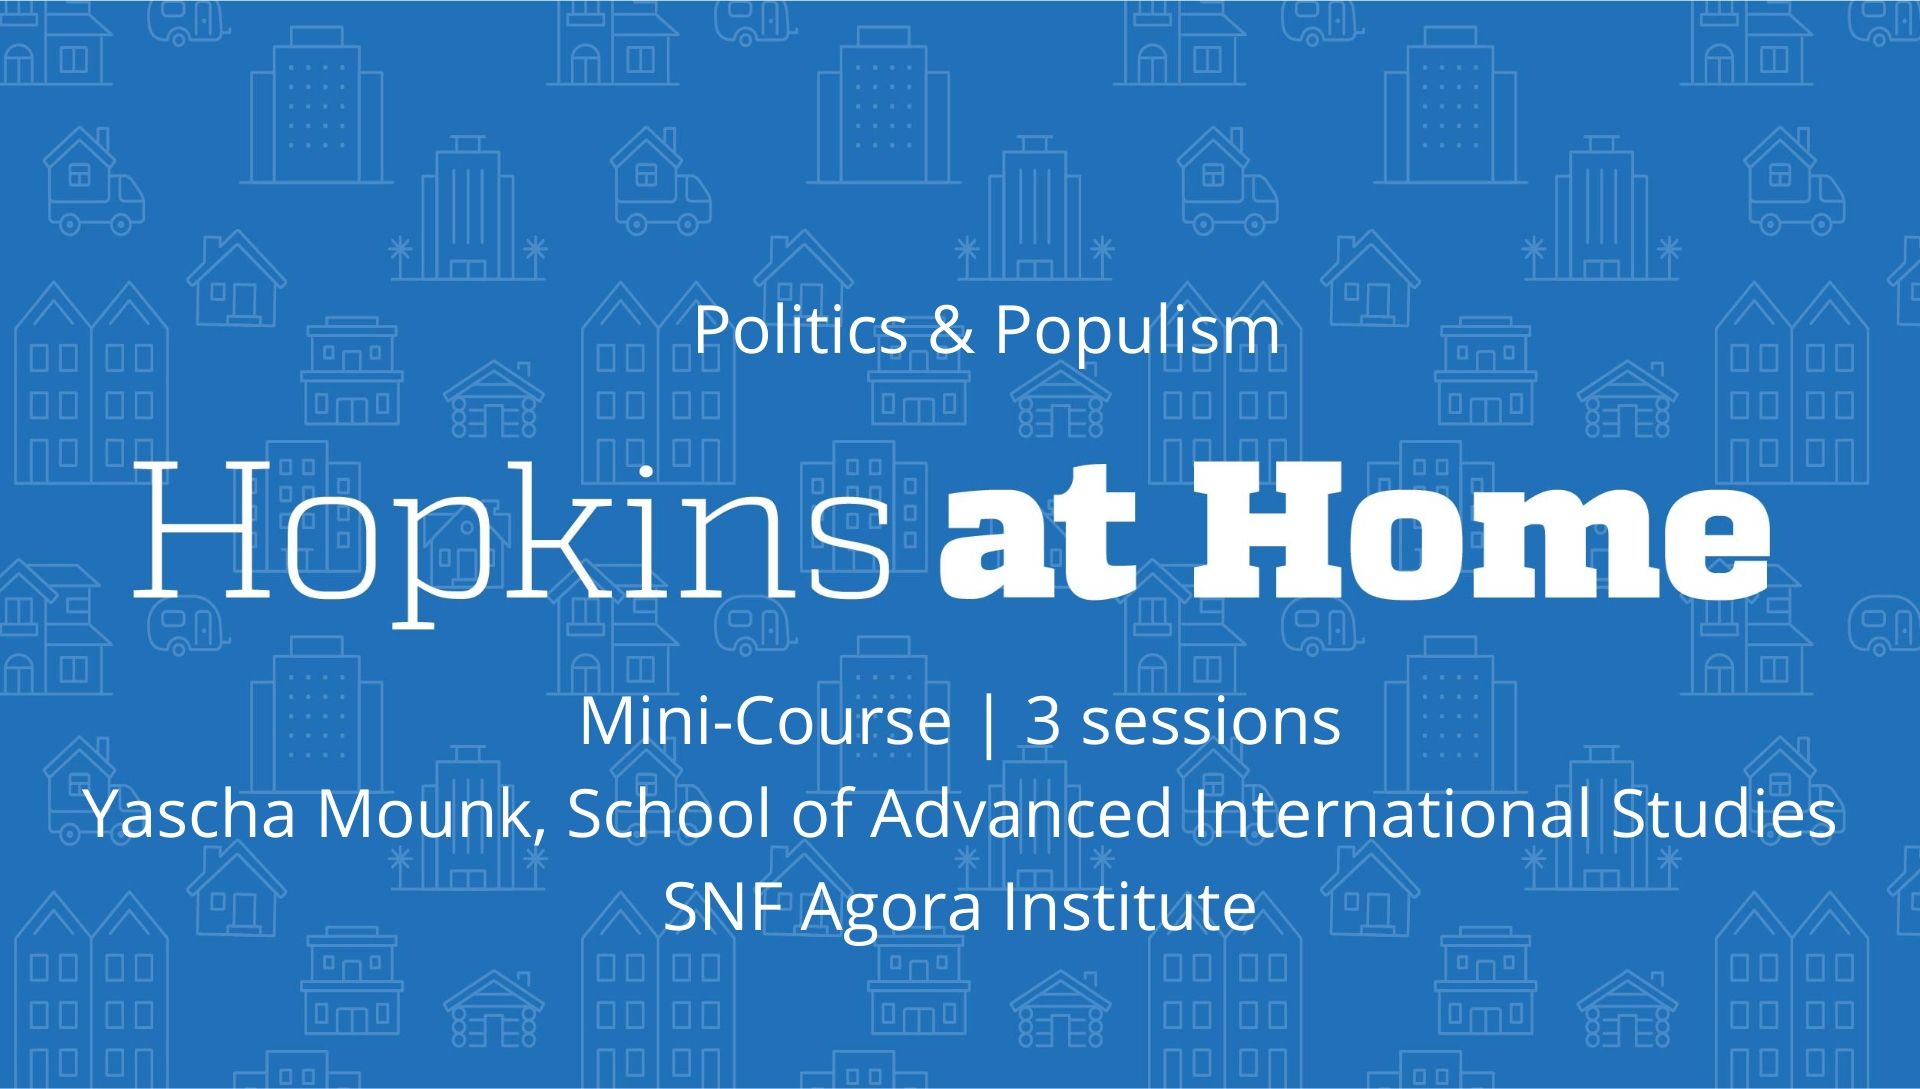 Politics and Populism header image